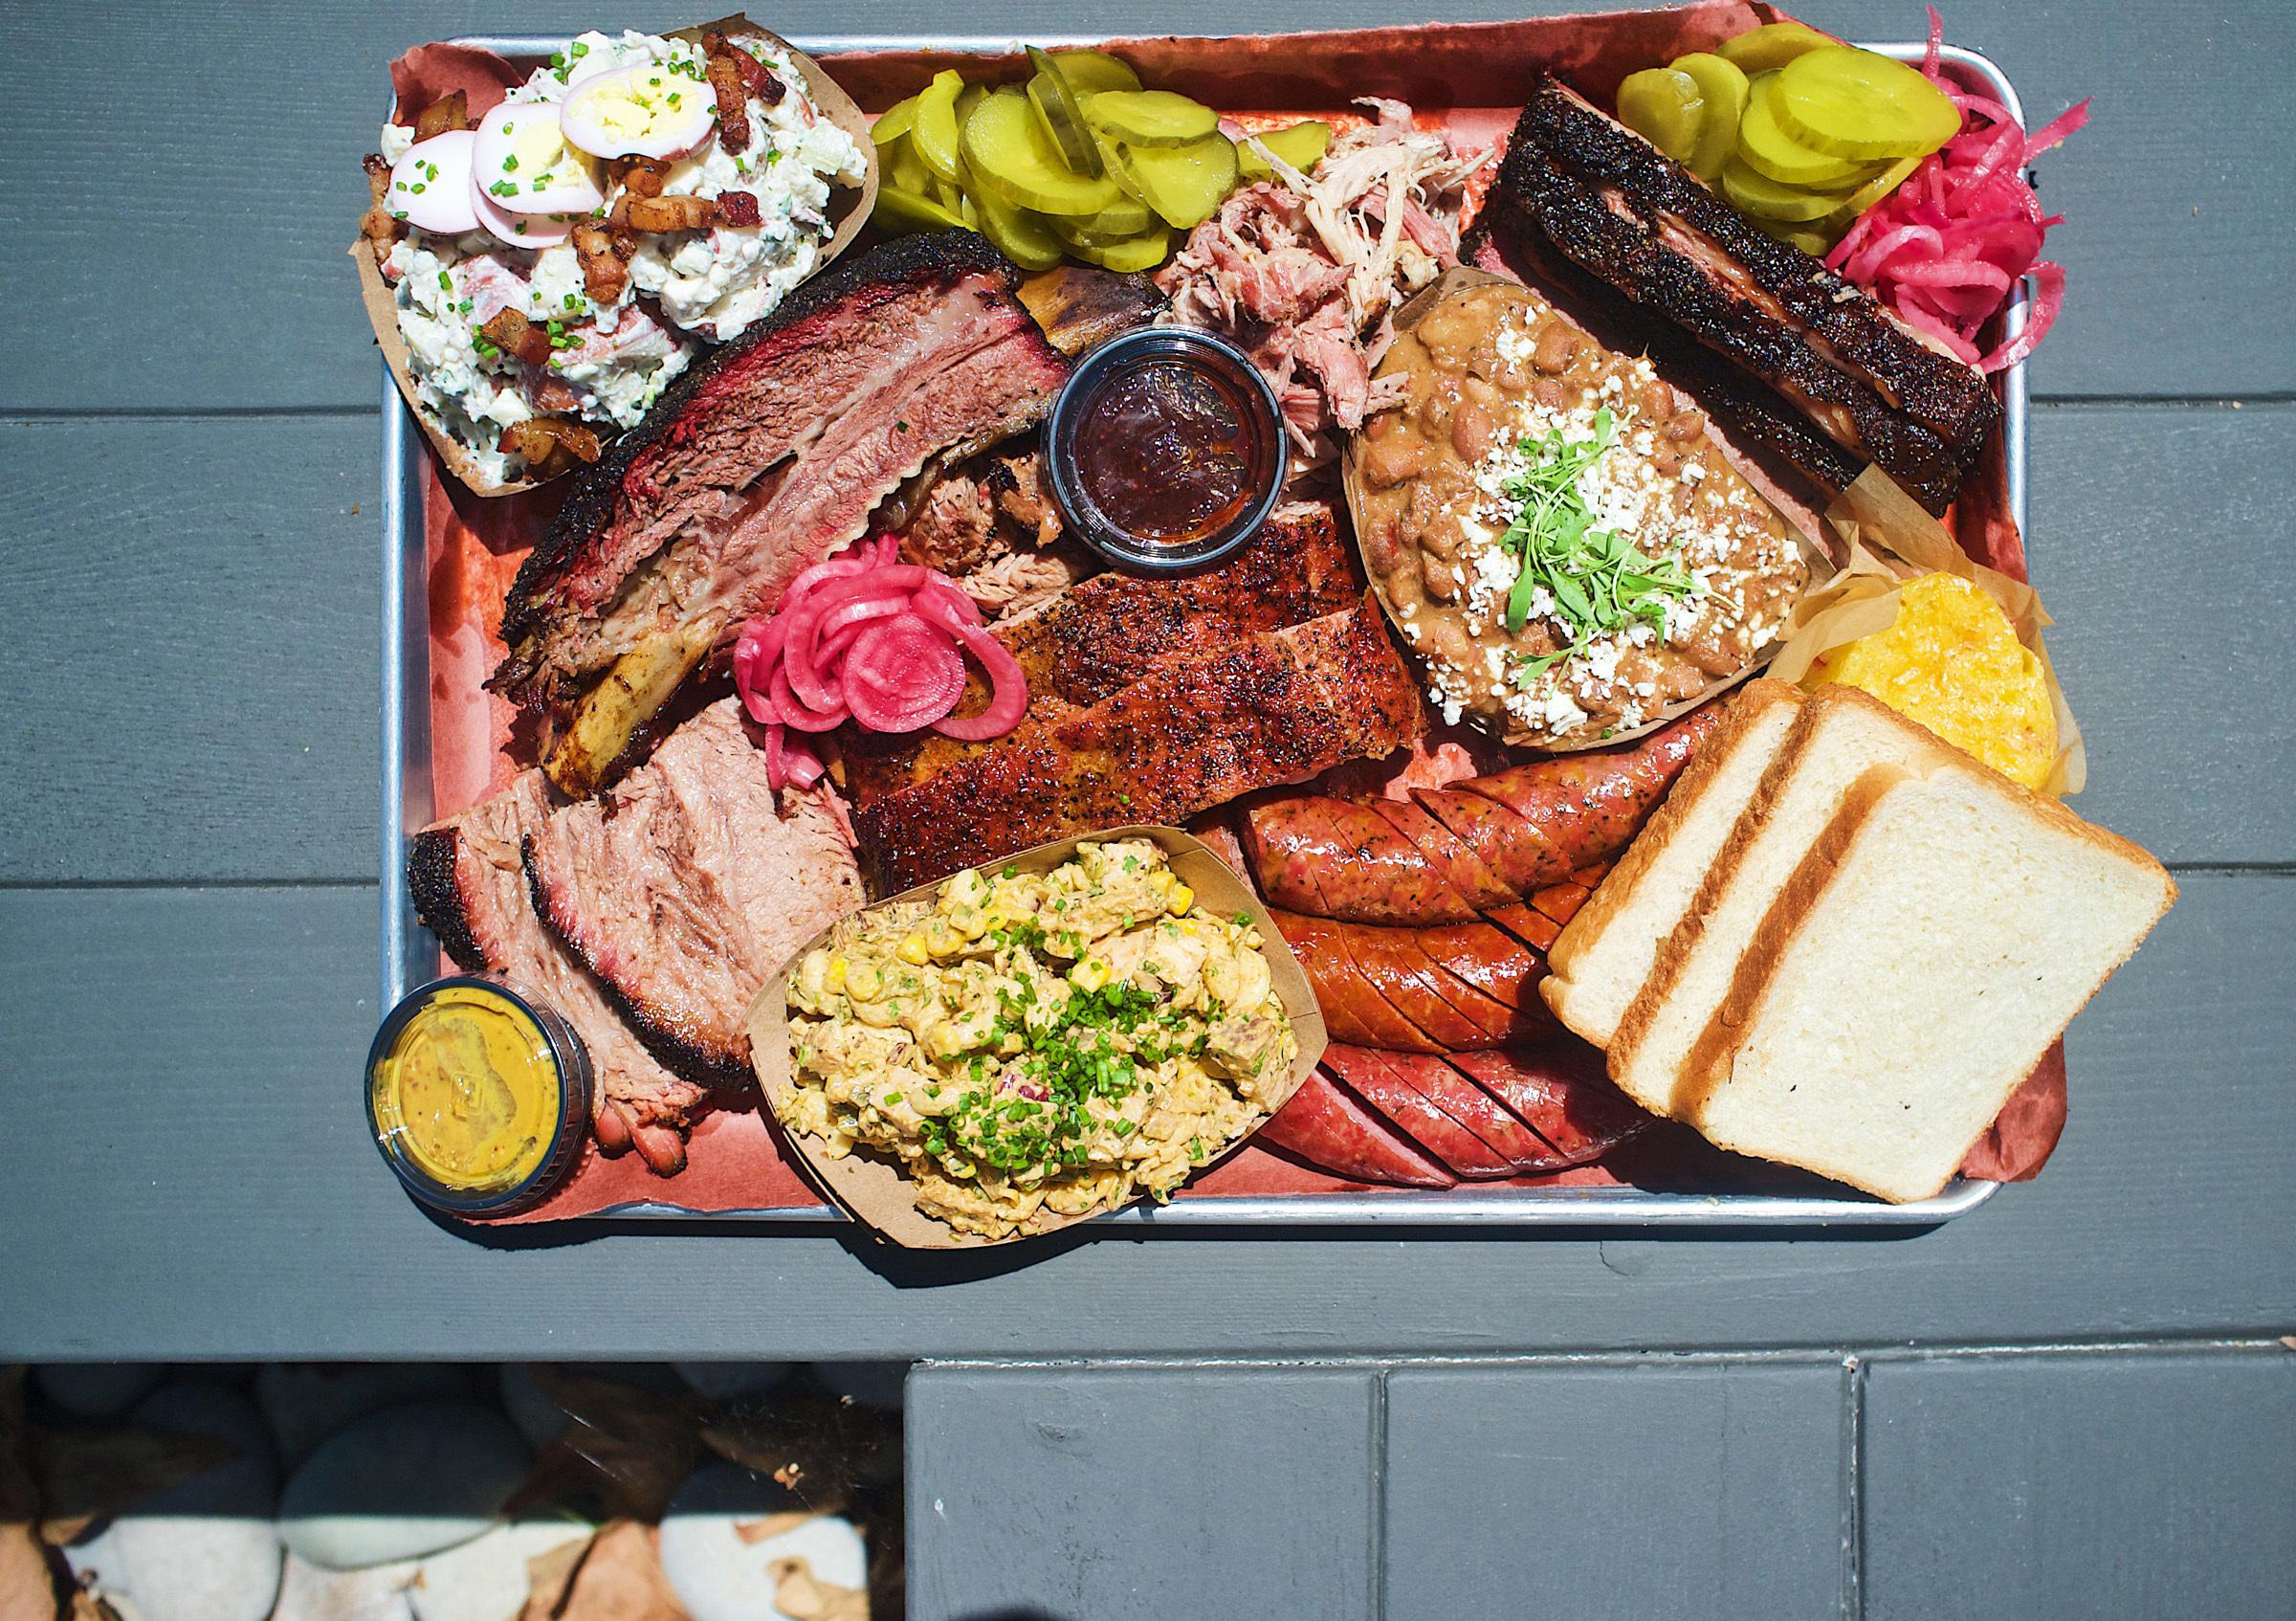 BBQ tray at Heritage Barbecue in San Juan Capistrano